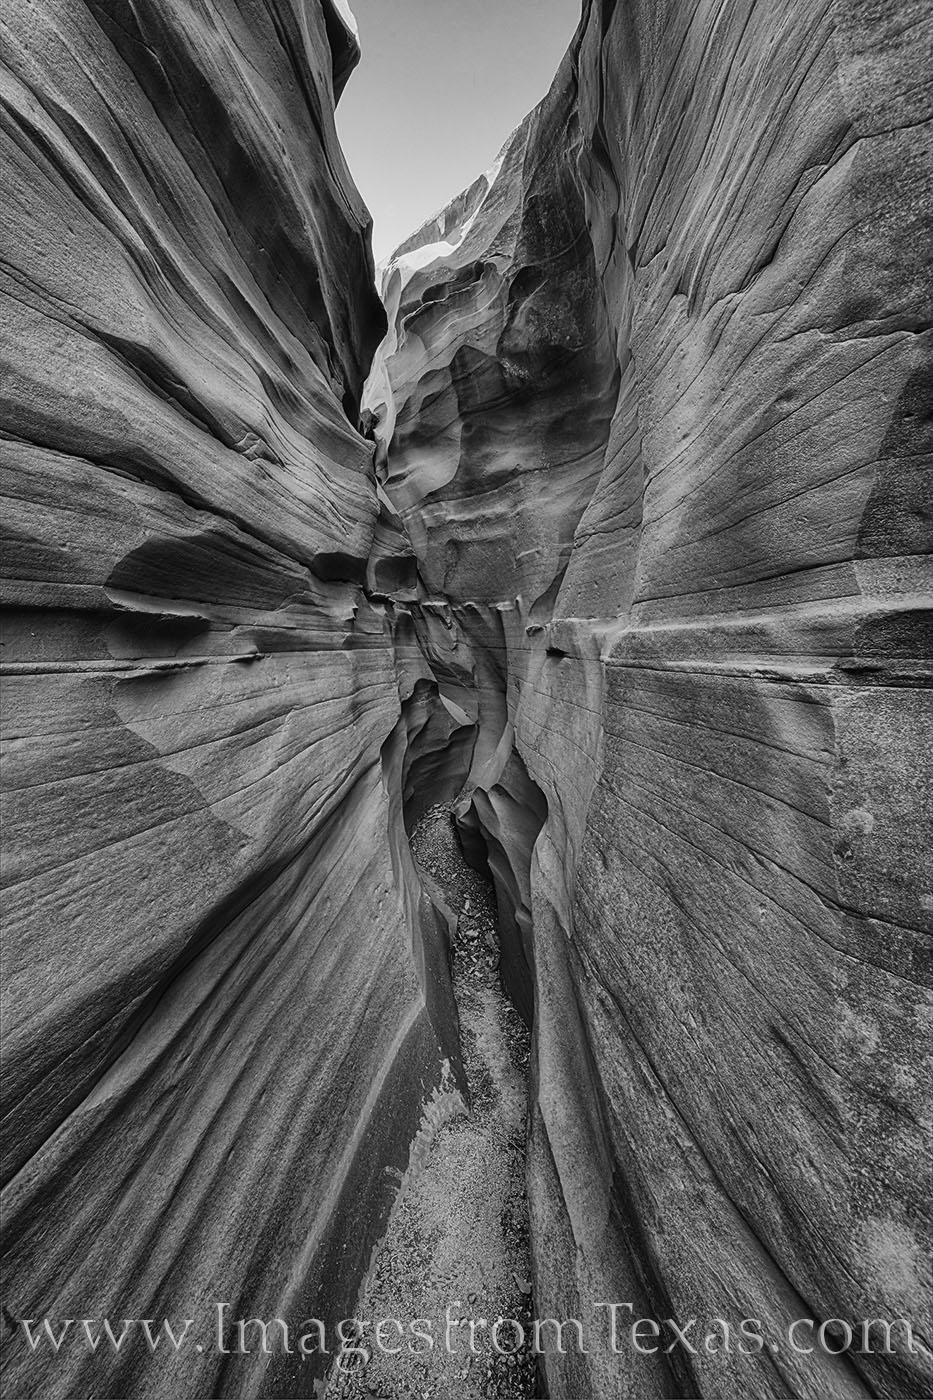 black and white, palo duro canyon, slot canyon, central utah slot canyon, secret canyon, texas canyons, texas state parks, central utah slot, slot canyons, texas slot canyons, texas hiking, hiking tex, photo